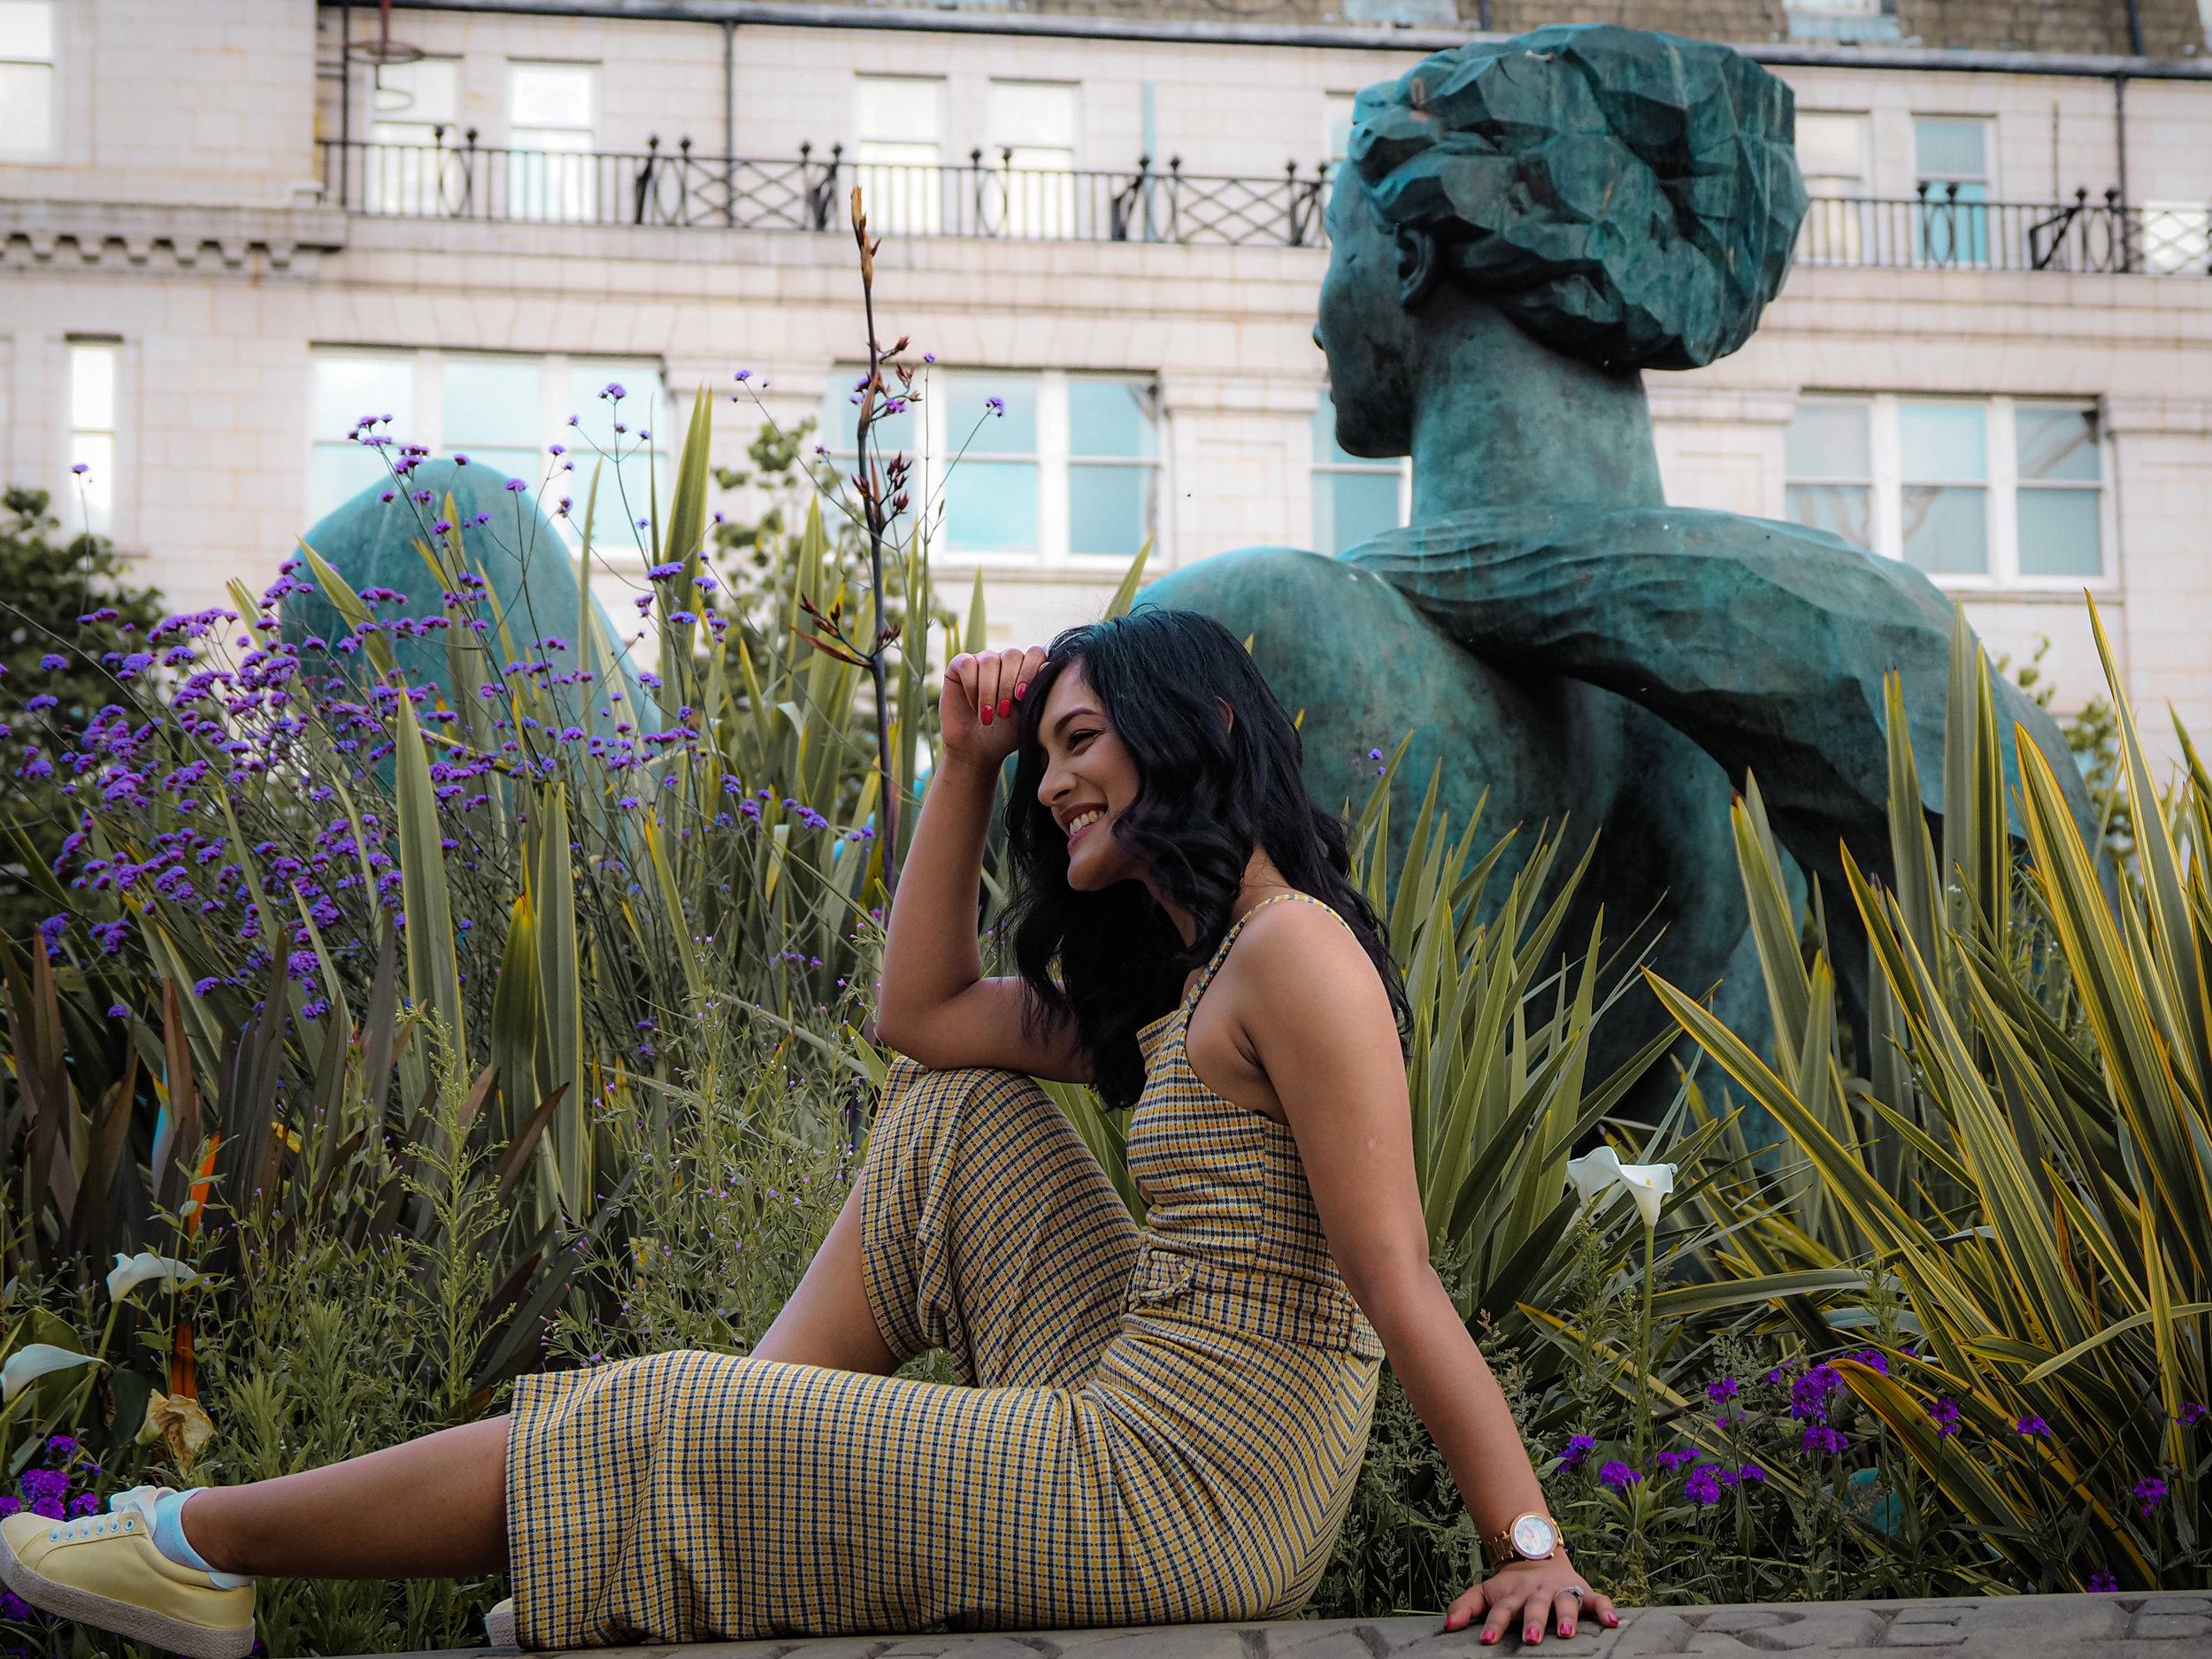 Ariya out posing a statue